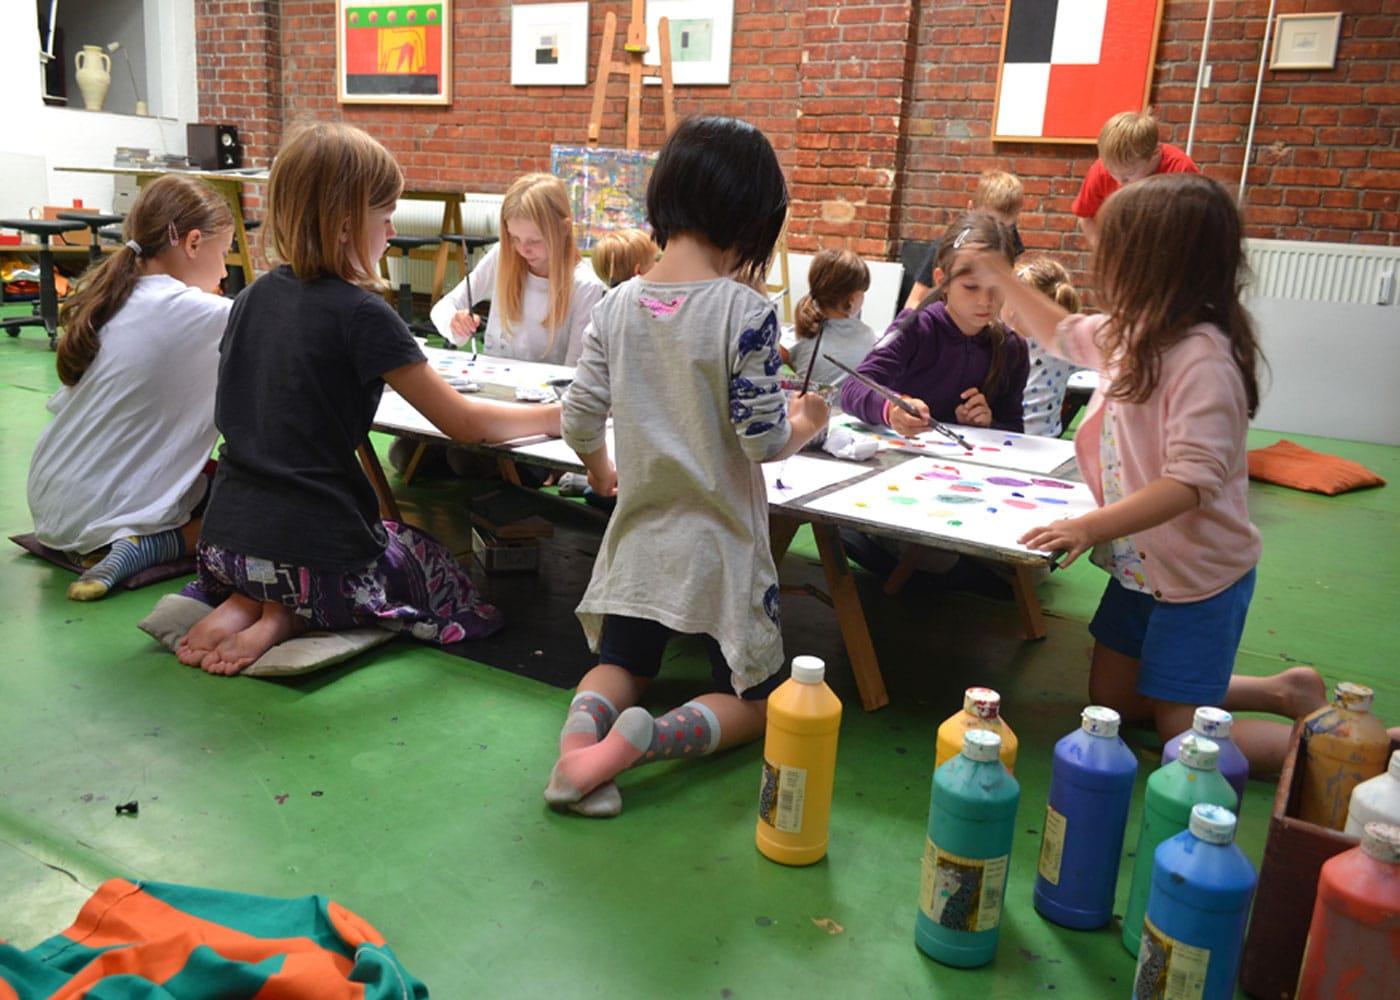 Sommerferien-Kunstkurse für Kinder in Berlin-Mitte // HIMBEER